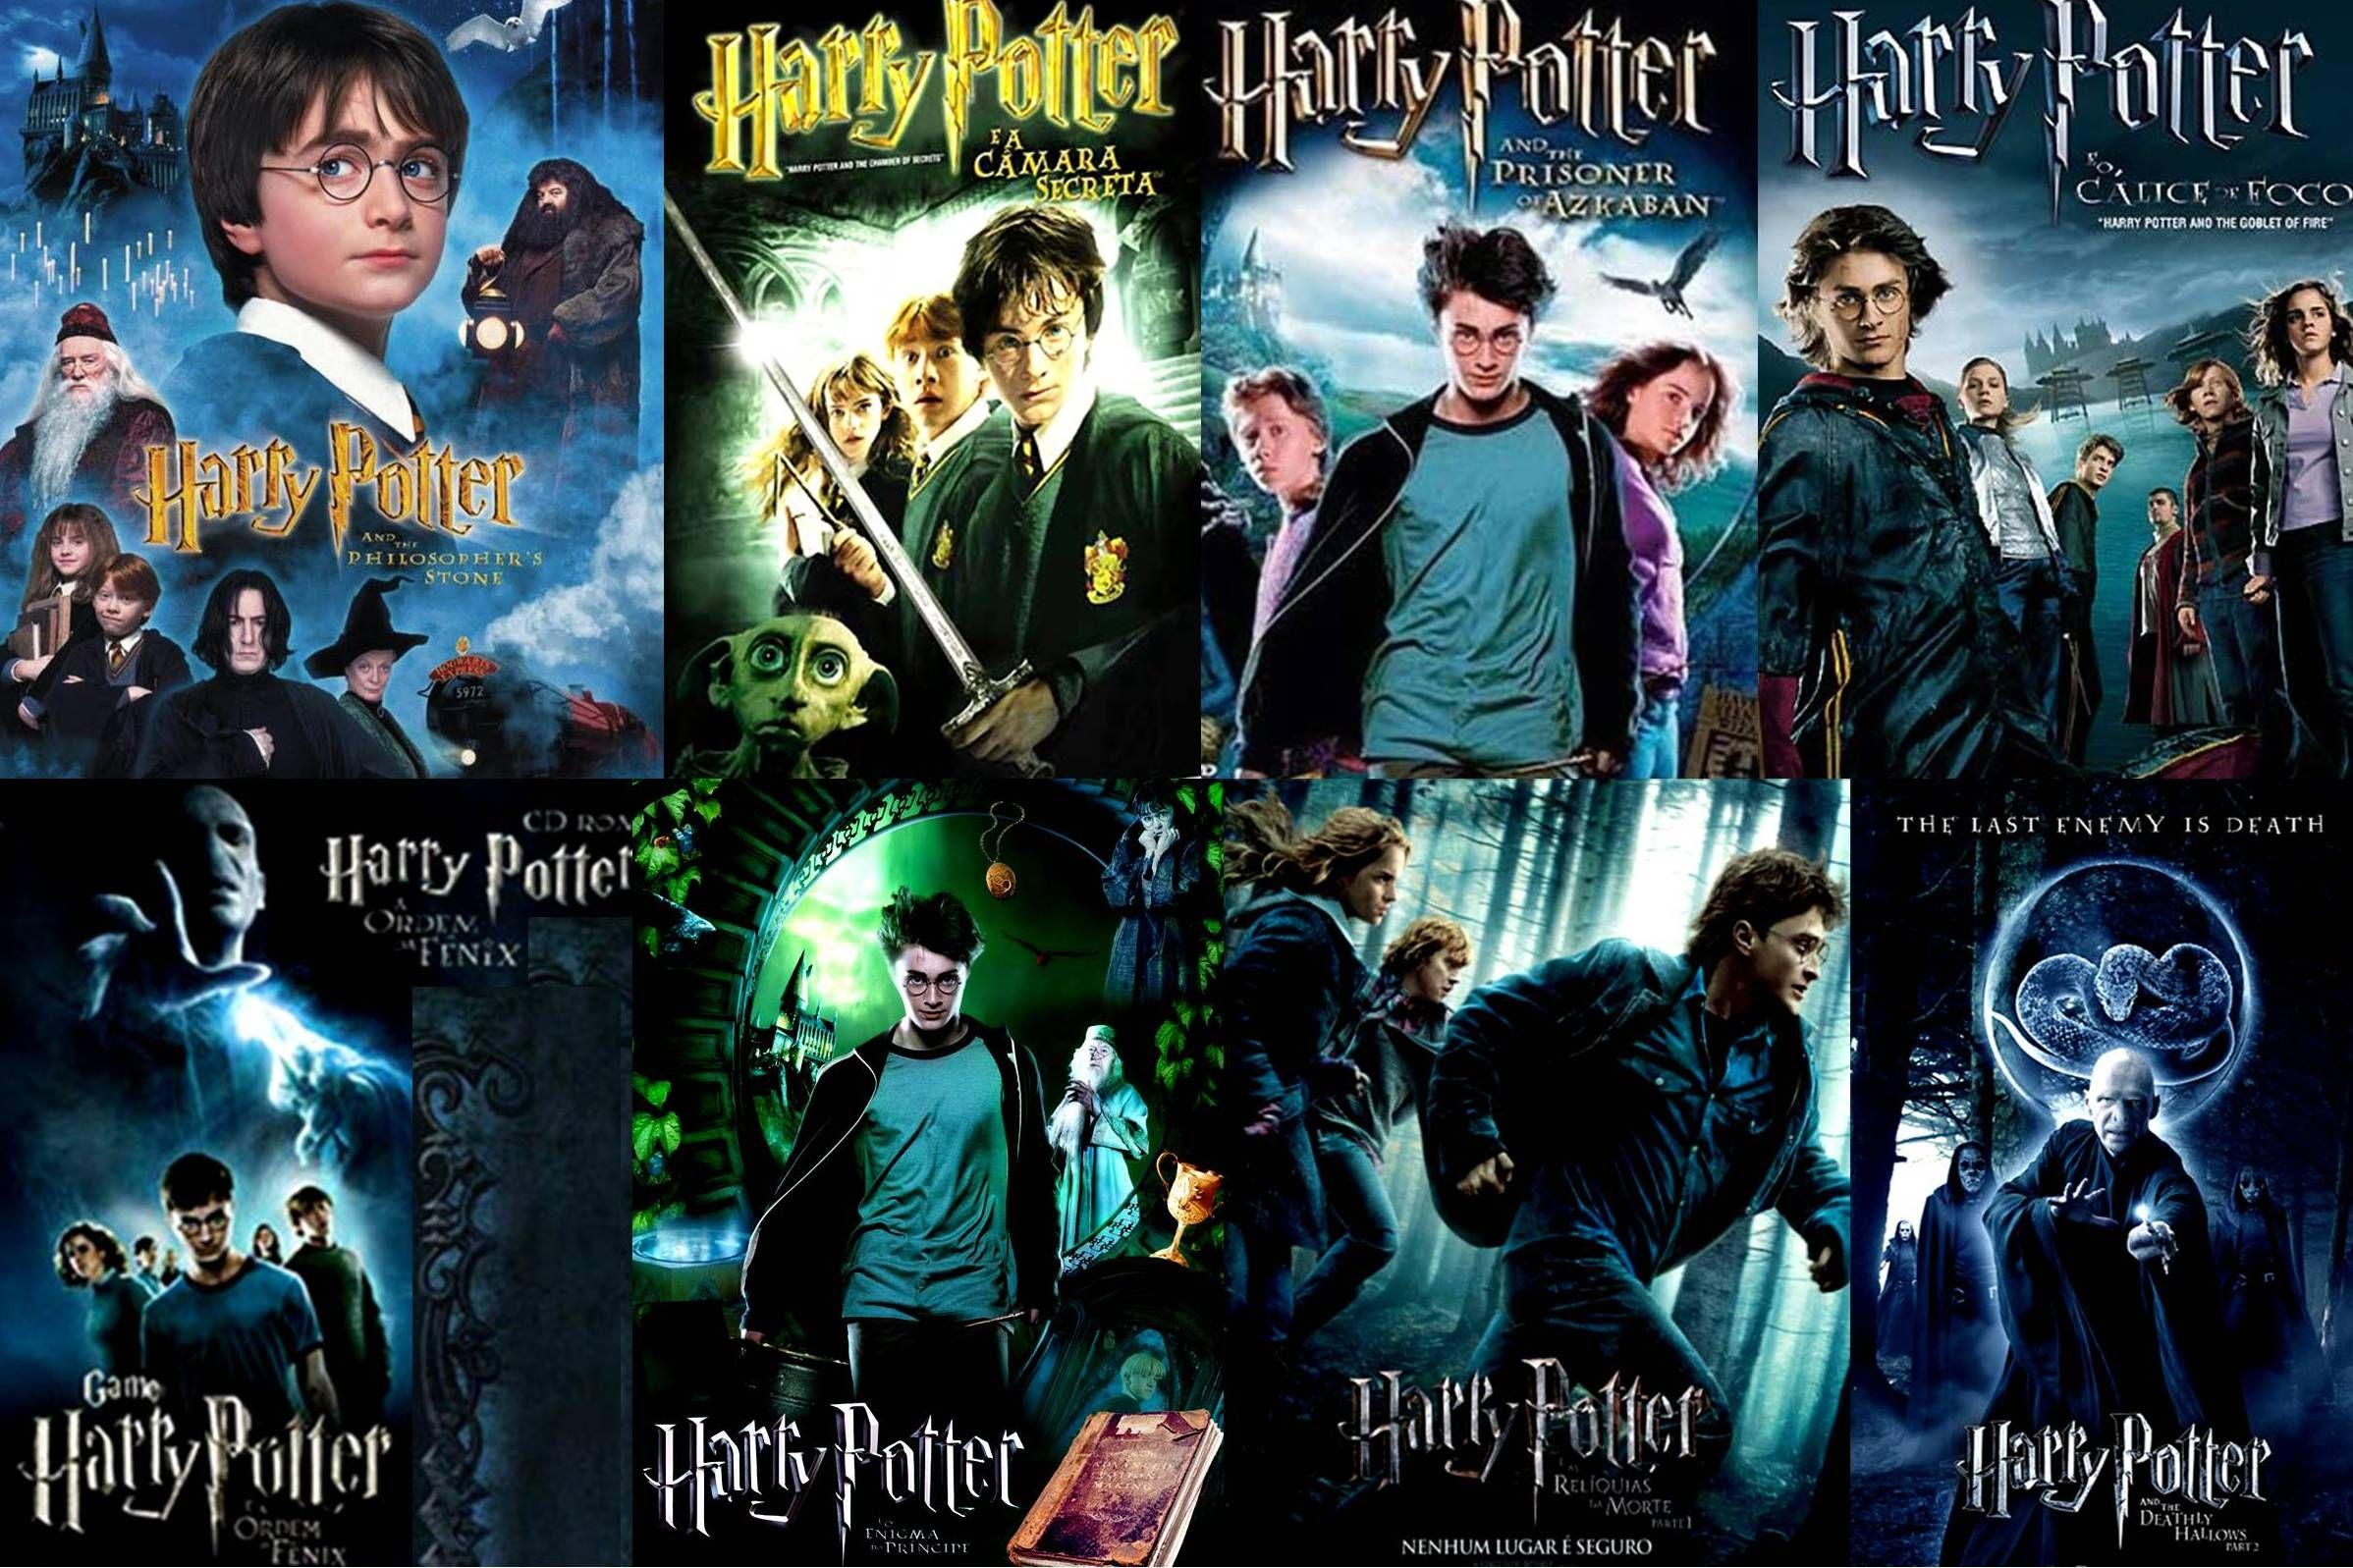 Harry Potter Saga Harry Potter Movies Harry Potter Films Harry Potter Film